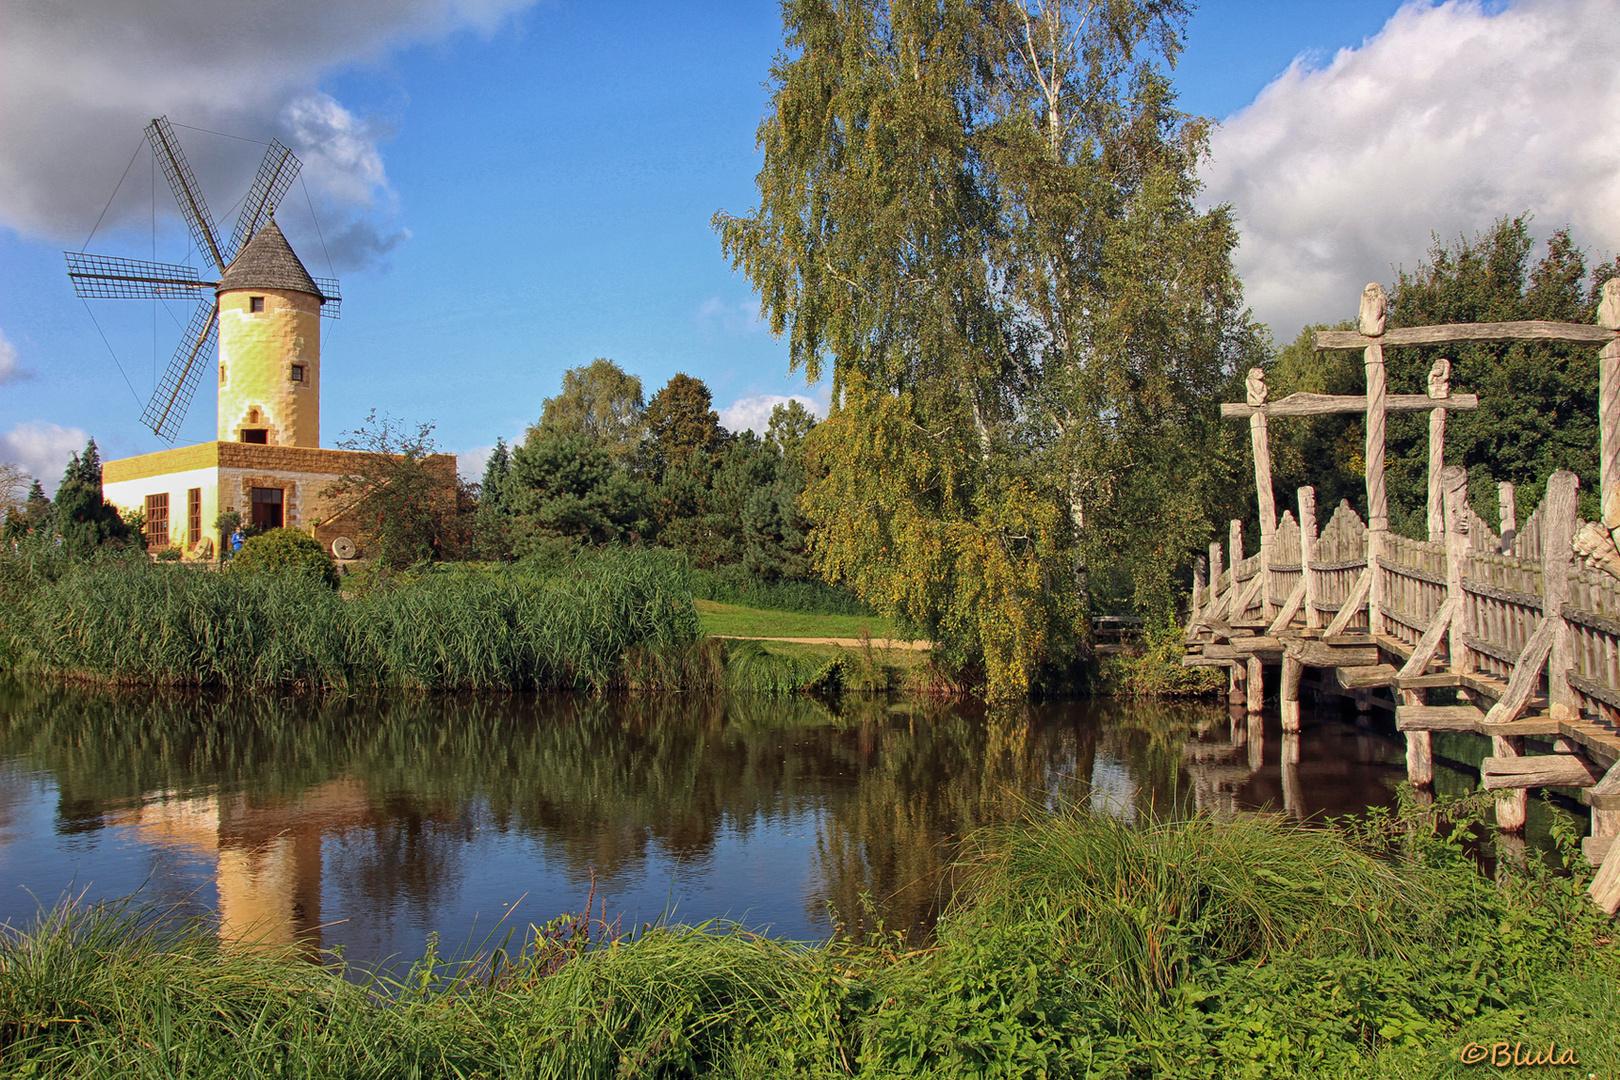 Mühlenmuseum Gifhorn